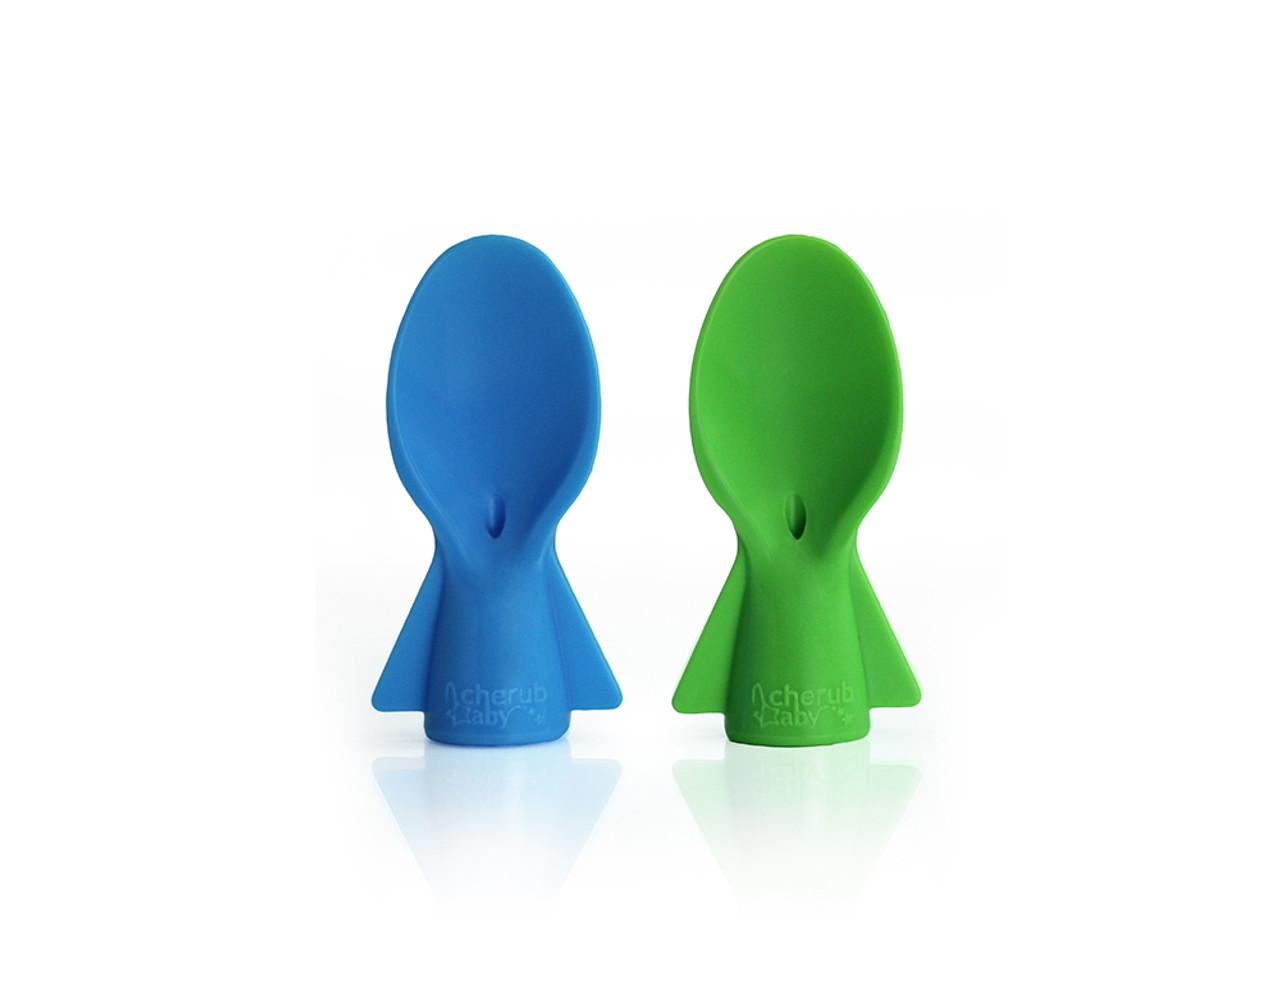 Cherub Baby Colour Change Food Pouch Spoons 2pk - BLUE/GREEN